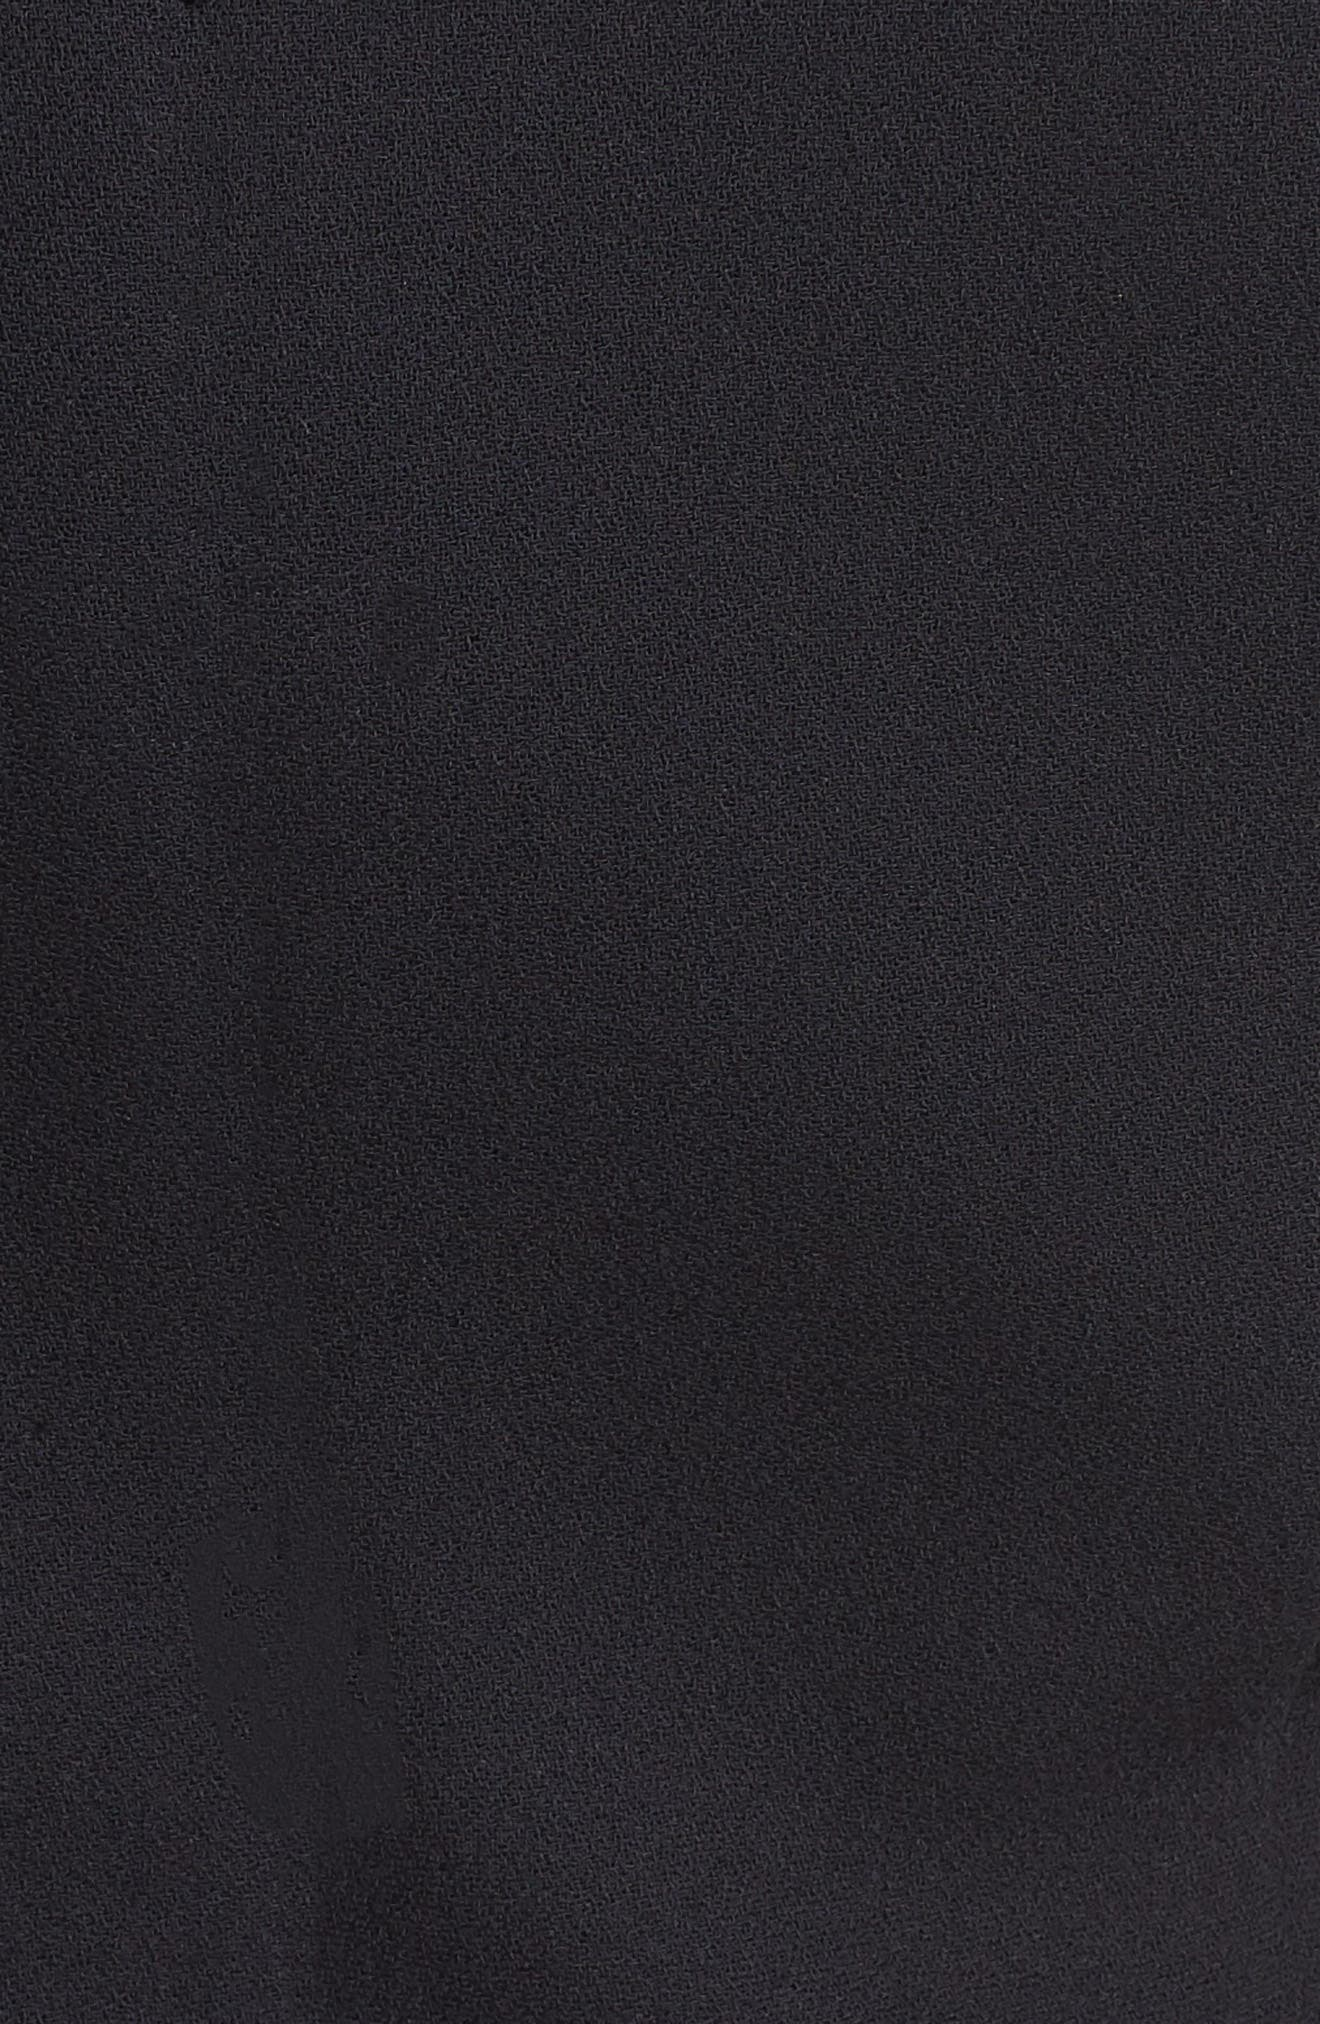 Denaka Sheath Dress,                             Alternate thumbnail 5, color,